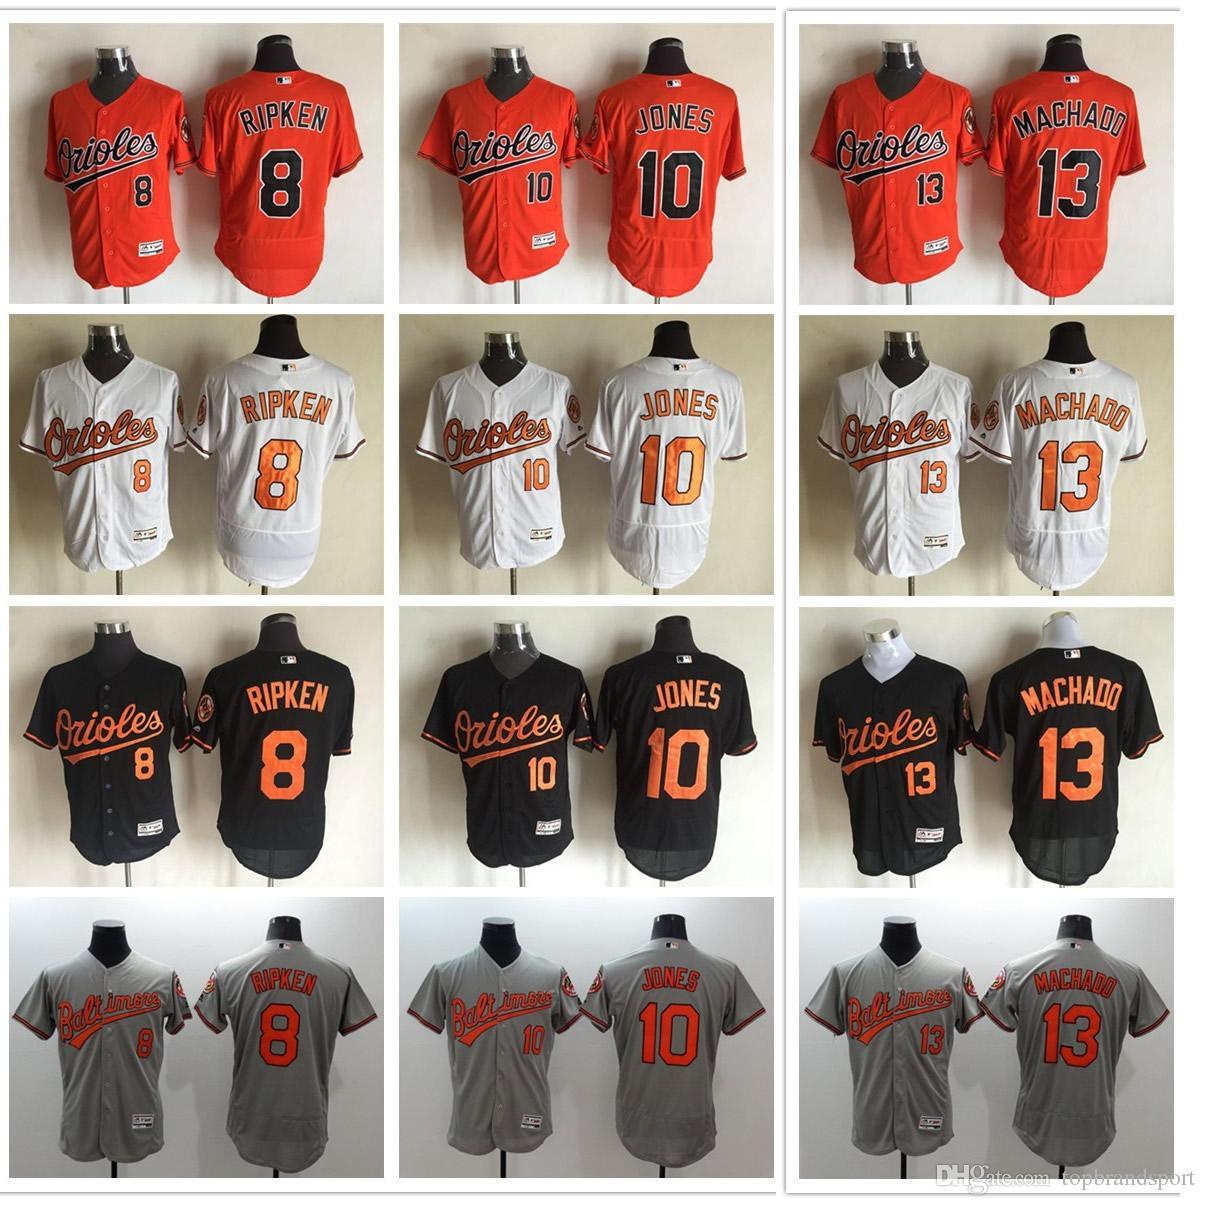 04378d4f6a3 ... 2017 2017 Baltimore Orioles Baseball Jerseys Flexbase 10 Adam Jones  Jerseys Men 13 Manny Machado Cool ...